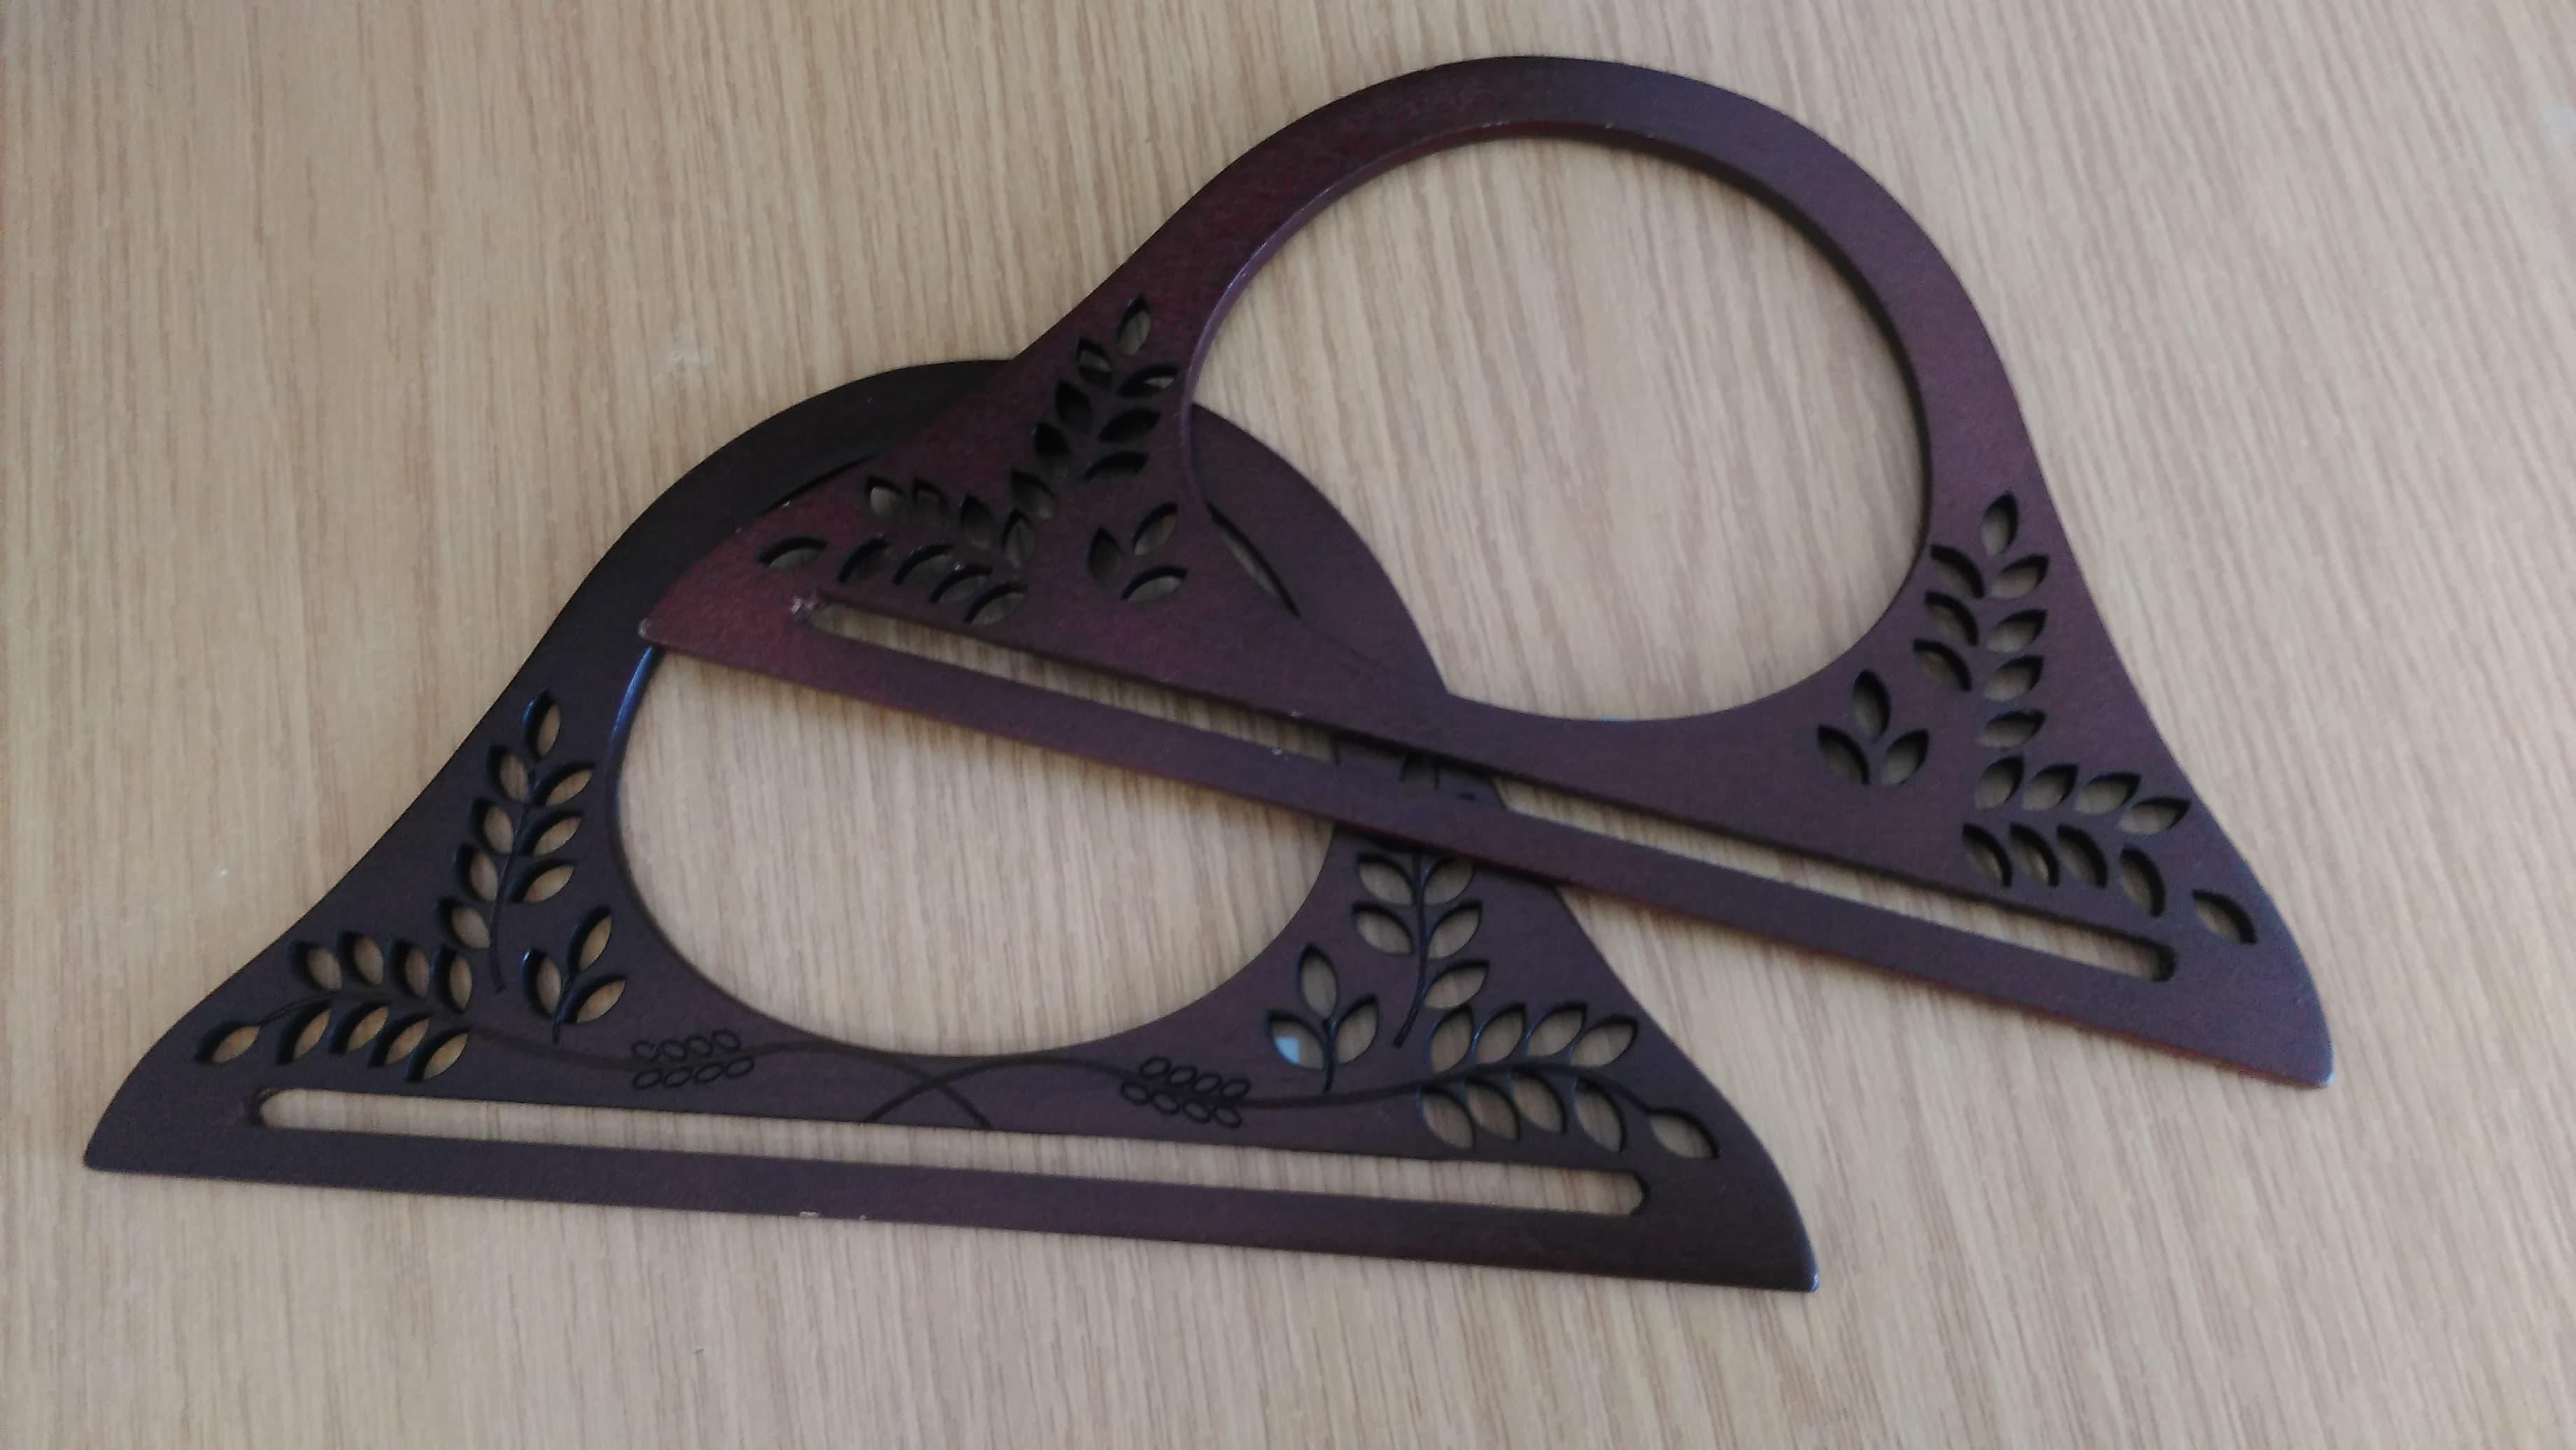 Houten handvat portemonnee Frame houten tas handvat DIY handtas accessoires photo review